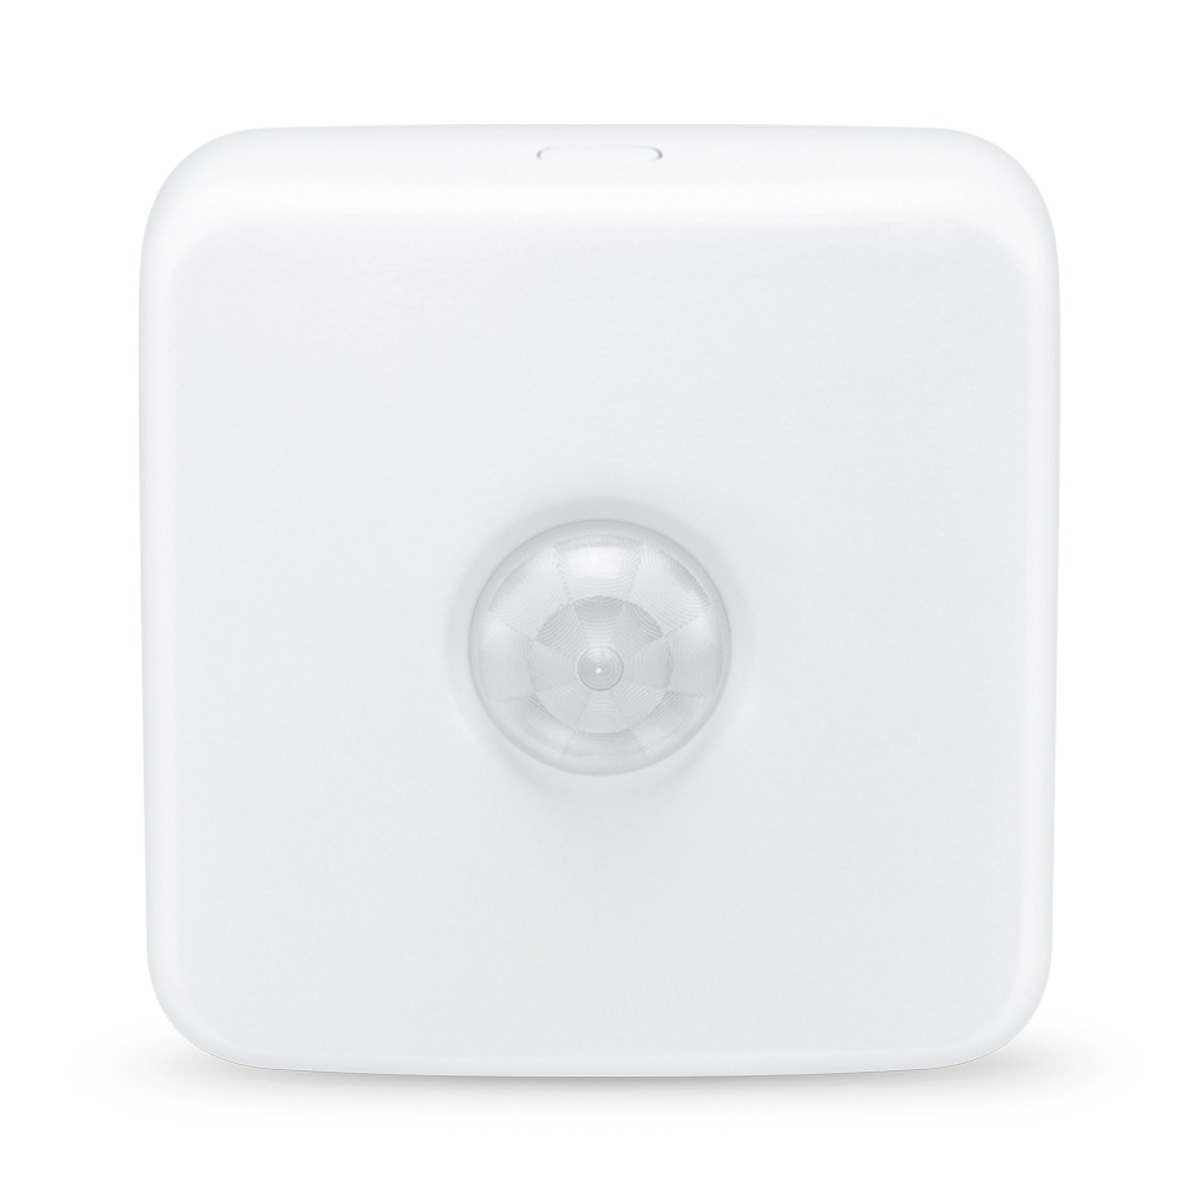 WiZ Motion Sensor